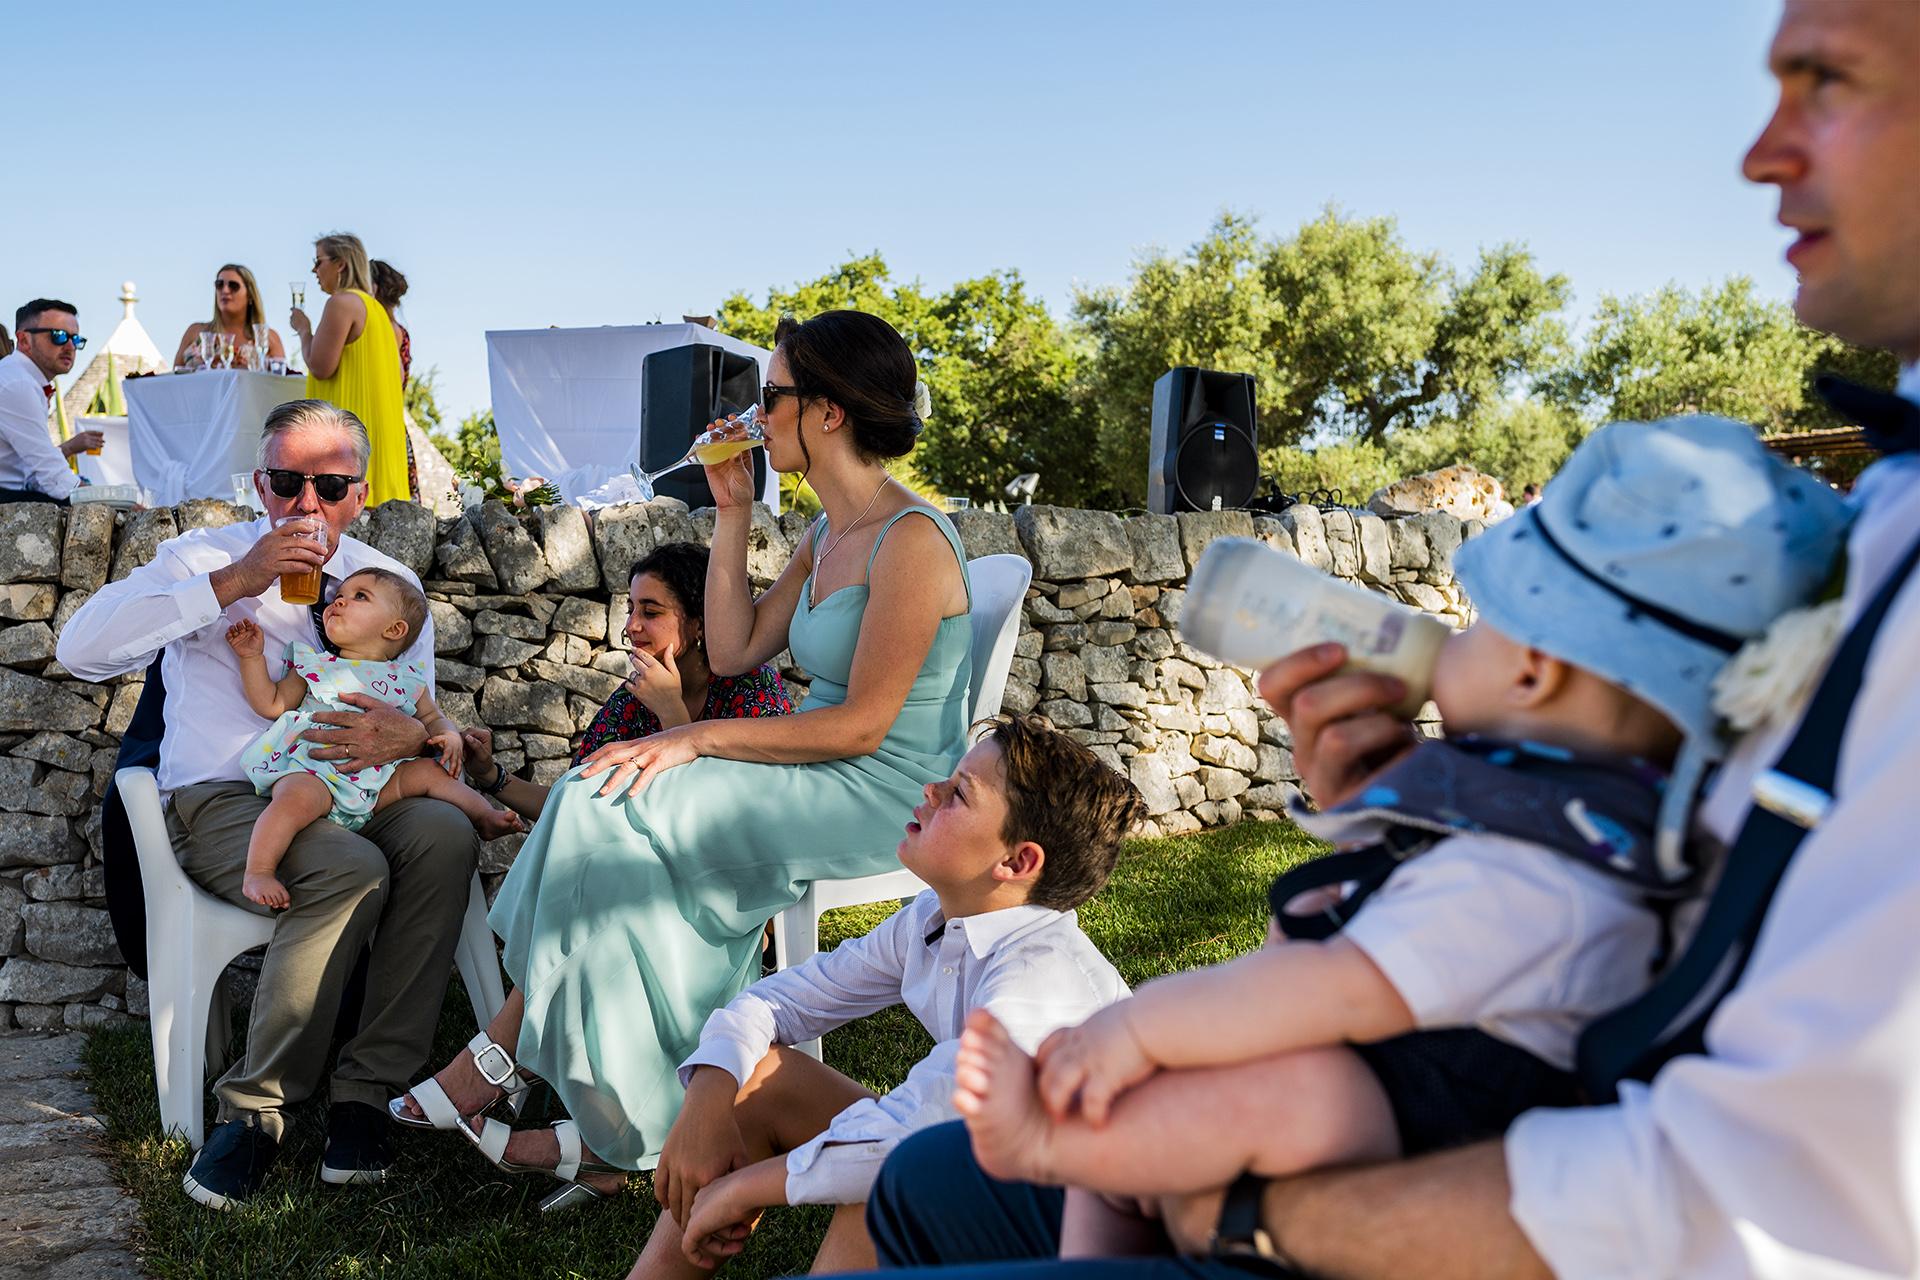 Pasquale Minniti, of Reggio Calabria, is a wedding photographer for puglia